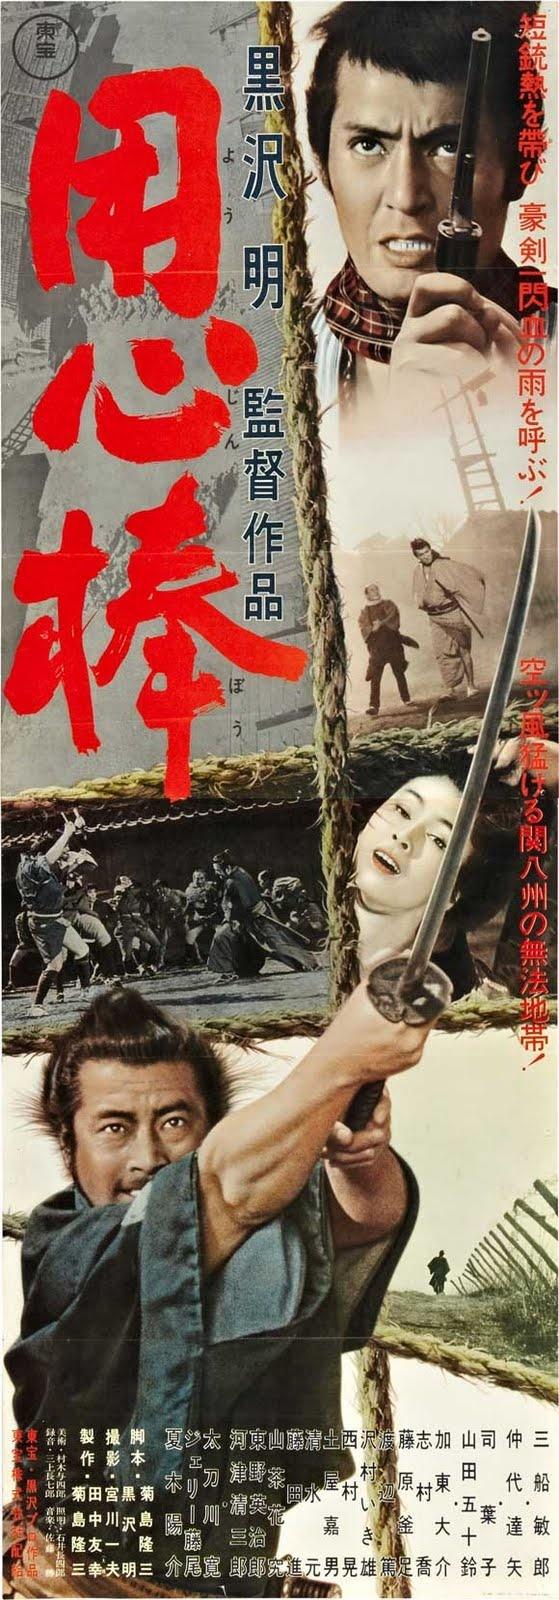 Yojimbo (El mercenario) / Yôjinbô / Yojimbo the Bodyguard (1961) - Akira Kurosawa